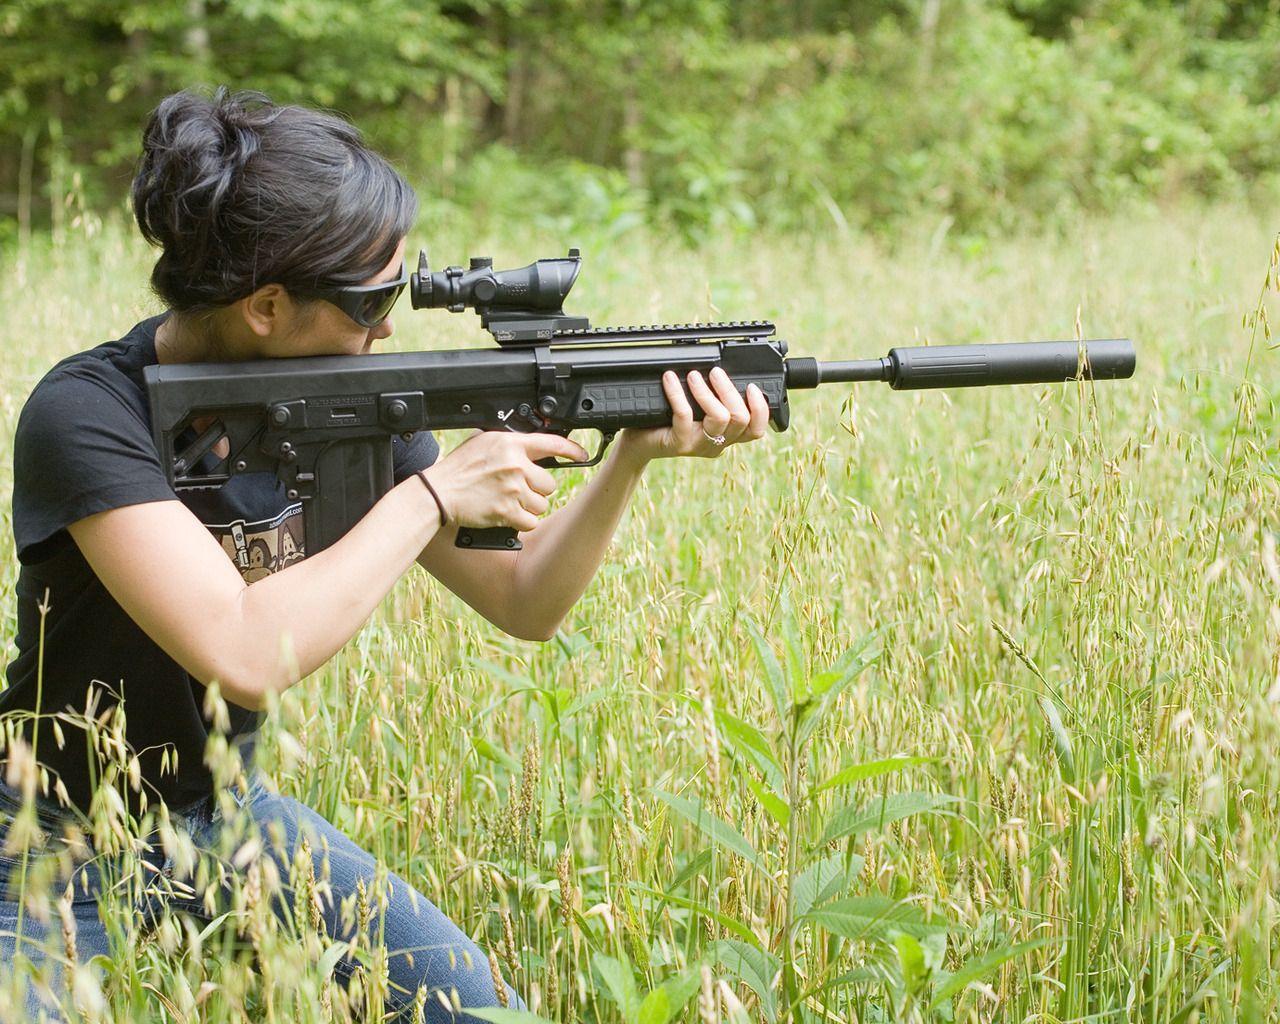 Pin on Hot girls n guns